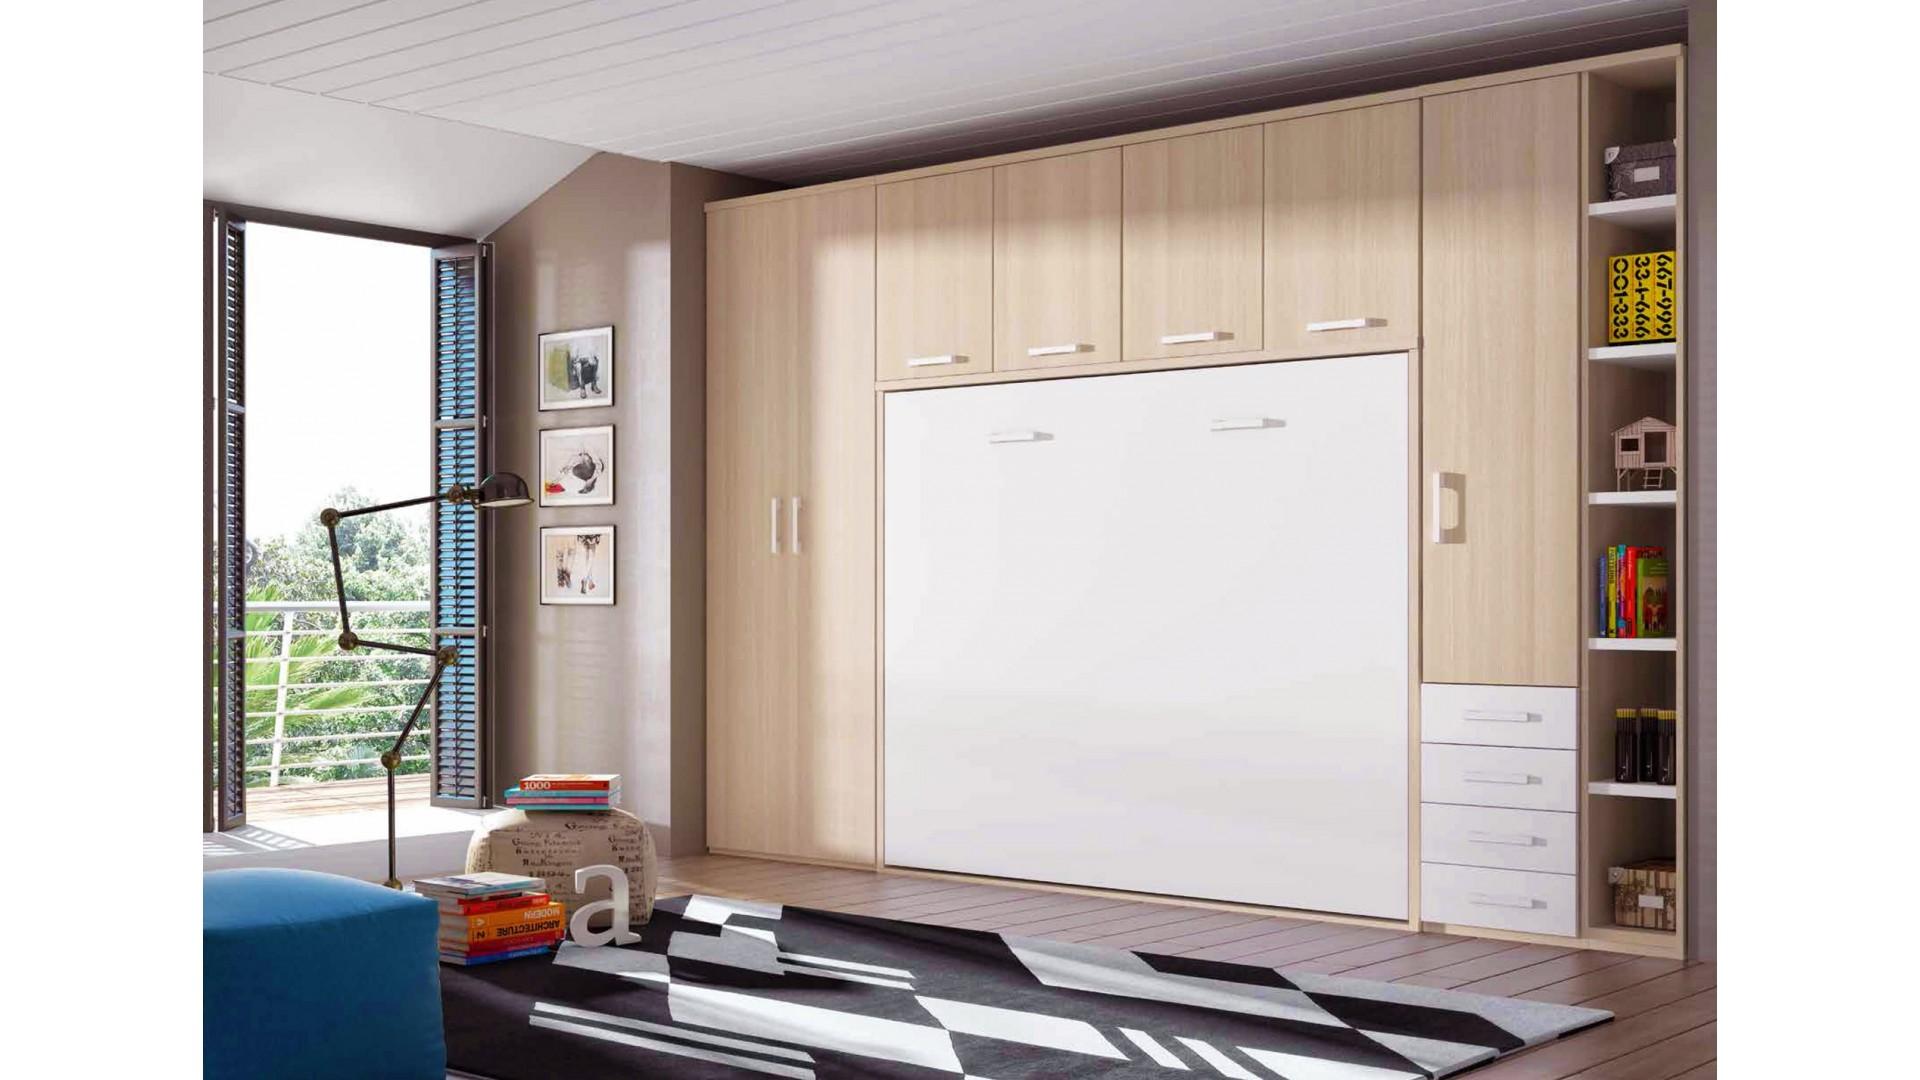 Chambre avec lit armoire escamotable avec couchage 160 x 200 PERSONNALISABLE F365 - GLICERIO